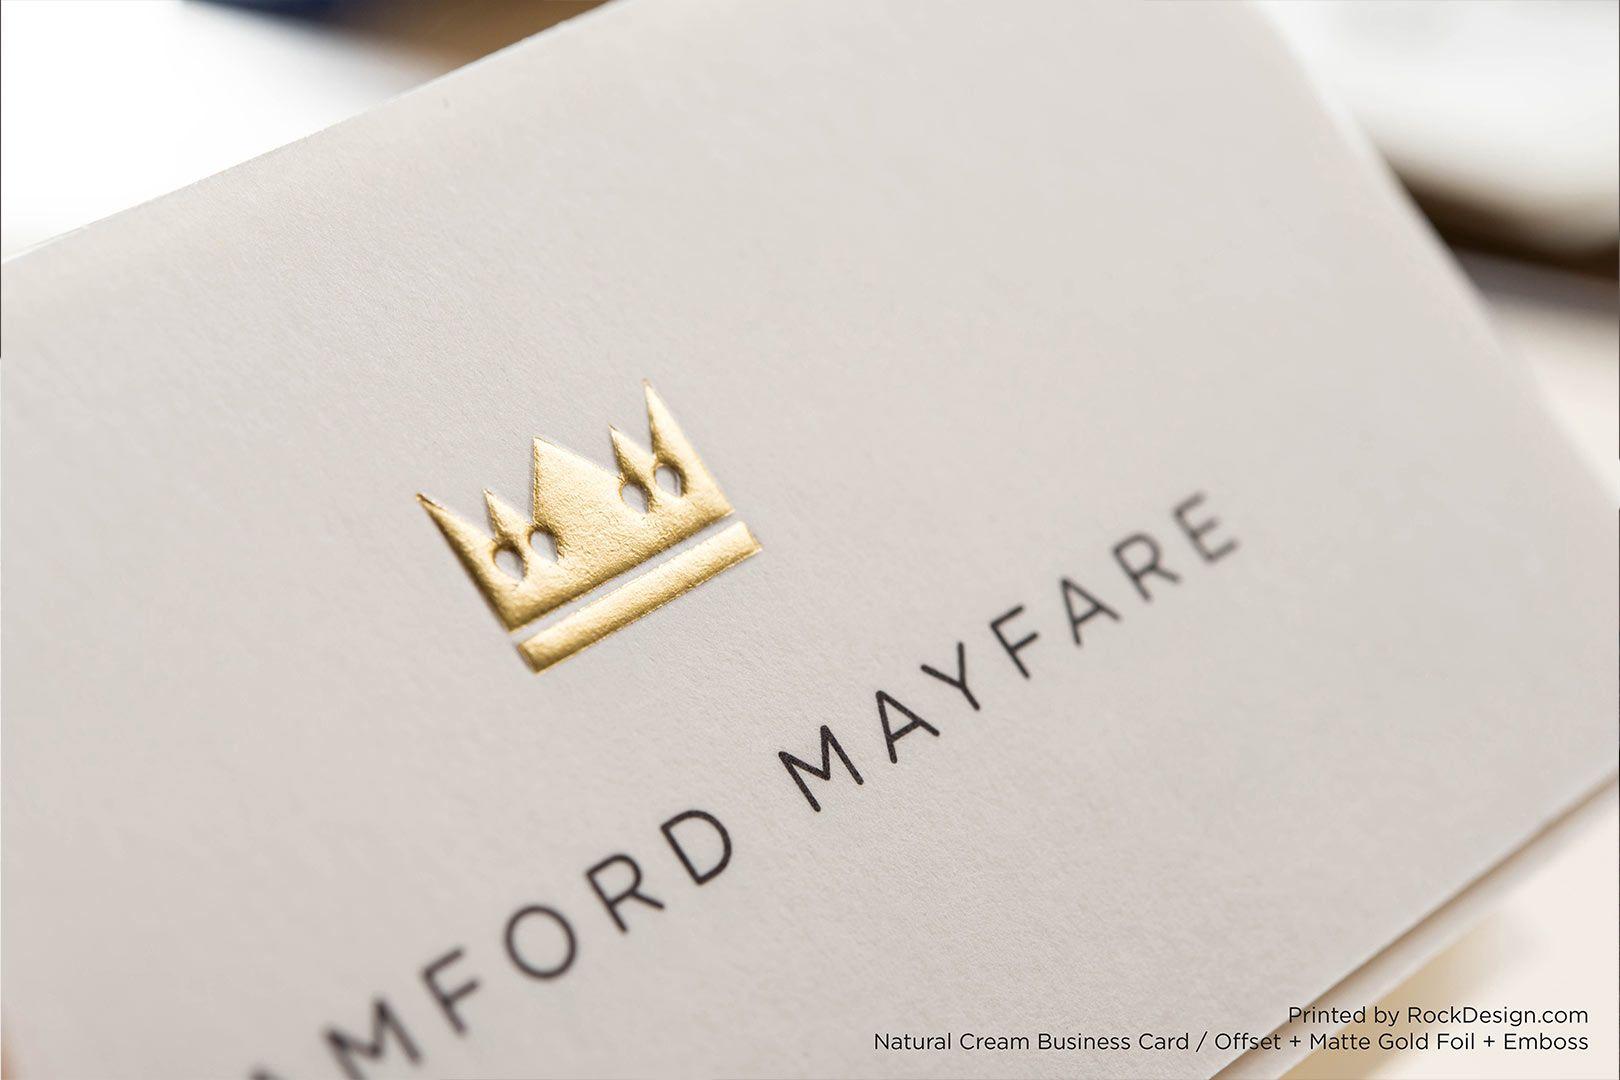 Pin by Faiyyu Kazi on Business cards | Pinterest | Business cards ...